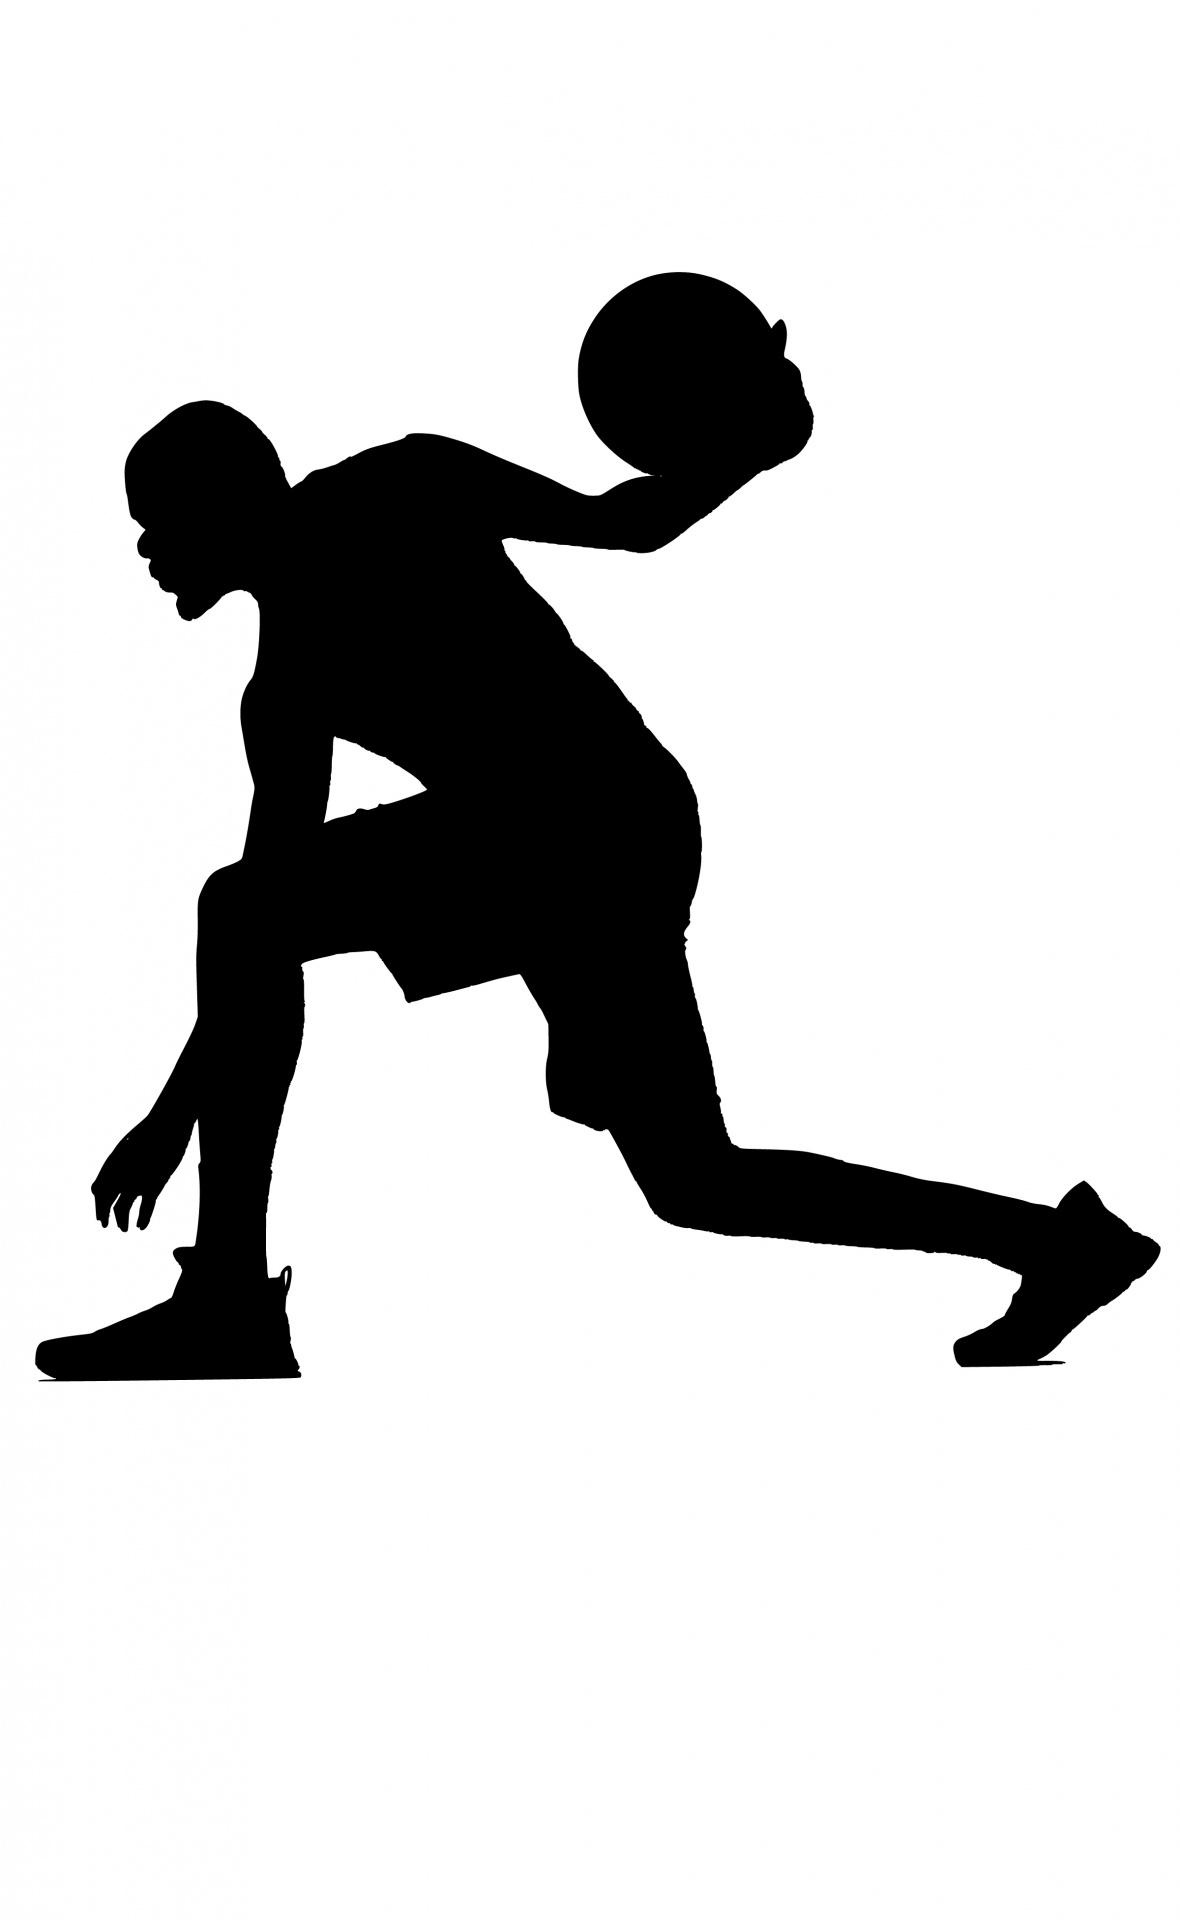 1180x1920 Basketball Silhouette Free Stock Photo